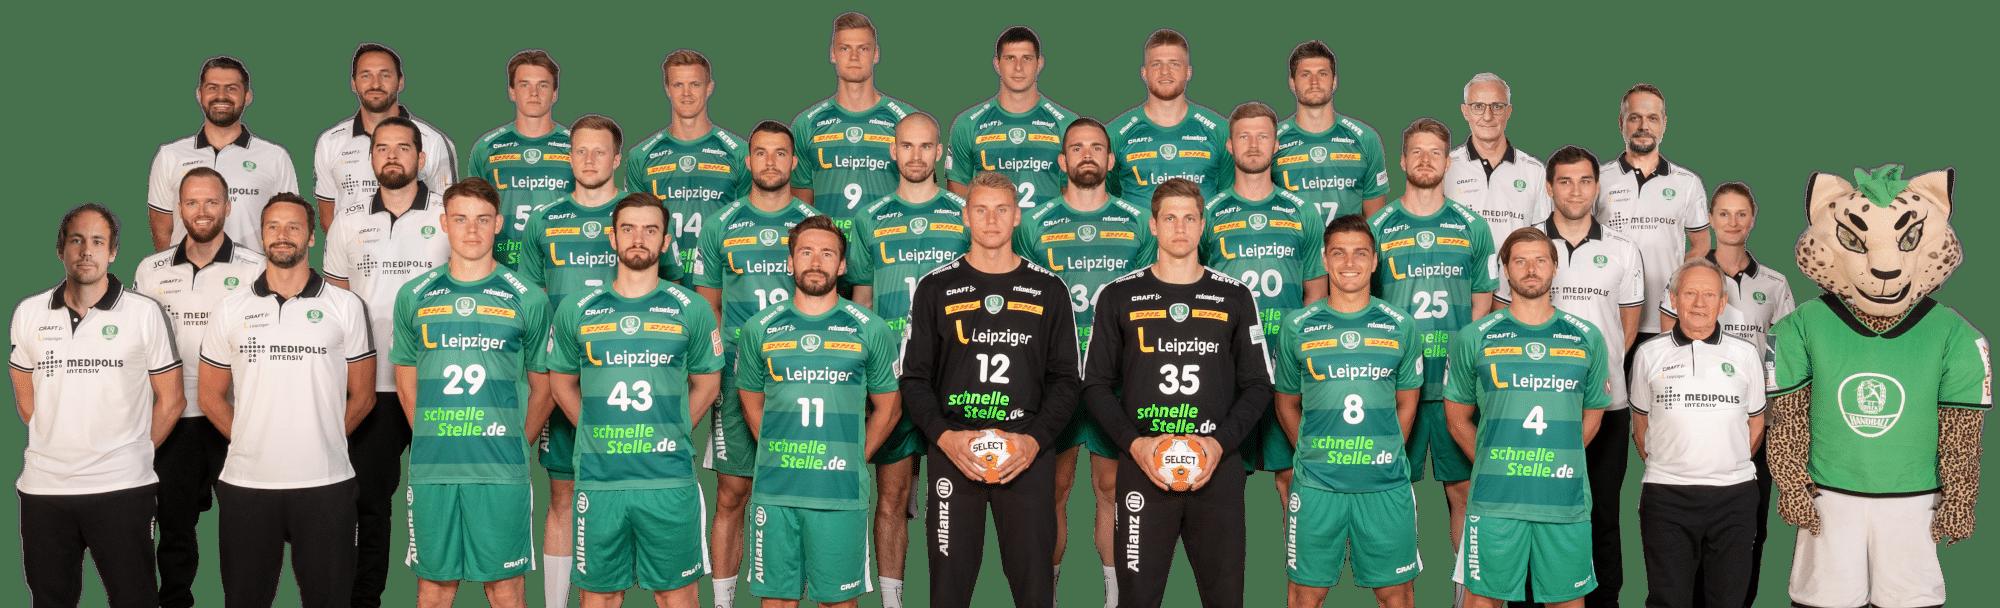 Team Bundesliga 20/21